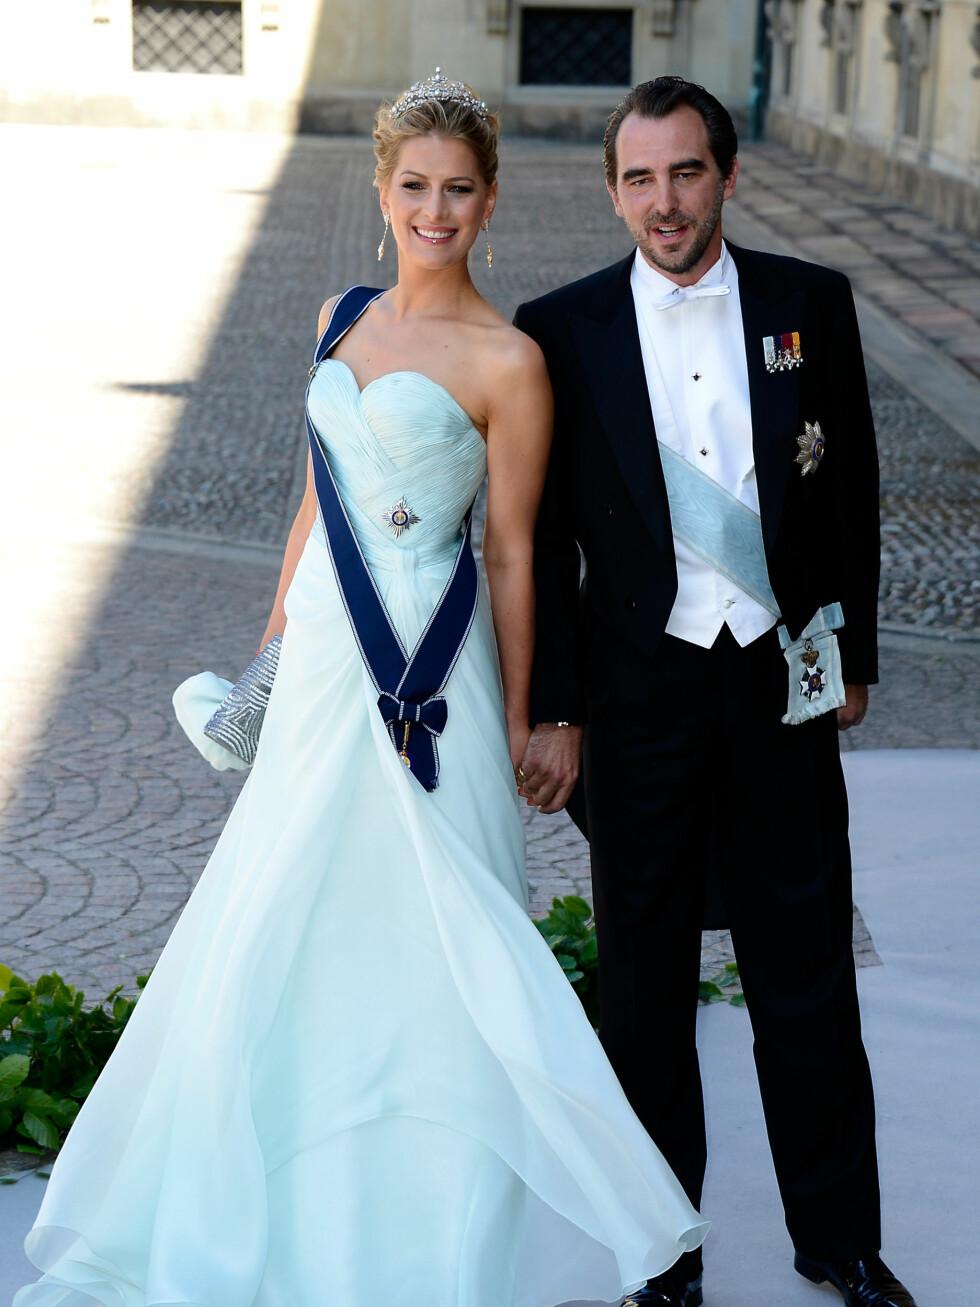 Prins Nikolaos og prinsesse Tatiana fra Hellas.  Foto: All Over Press